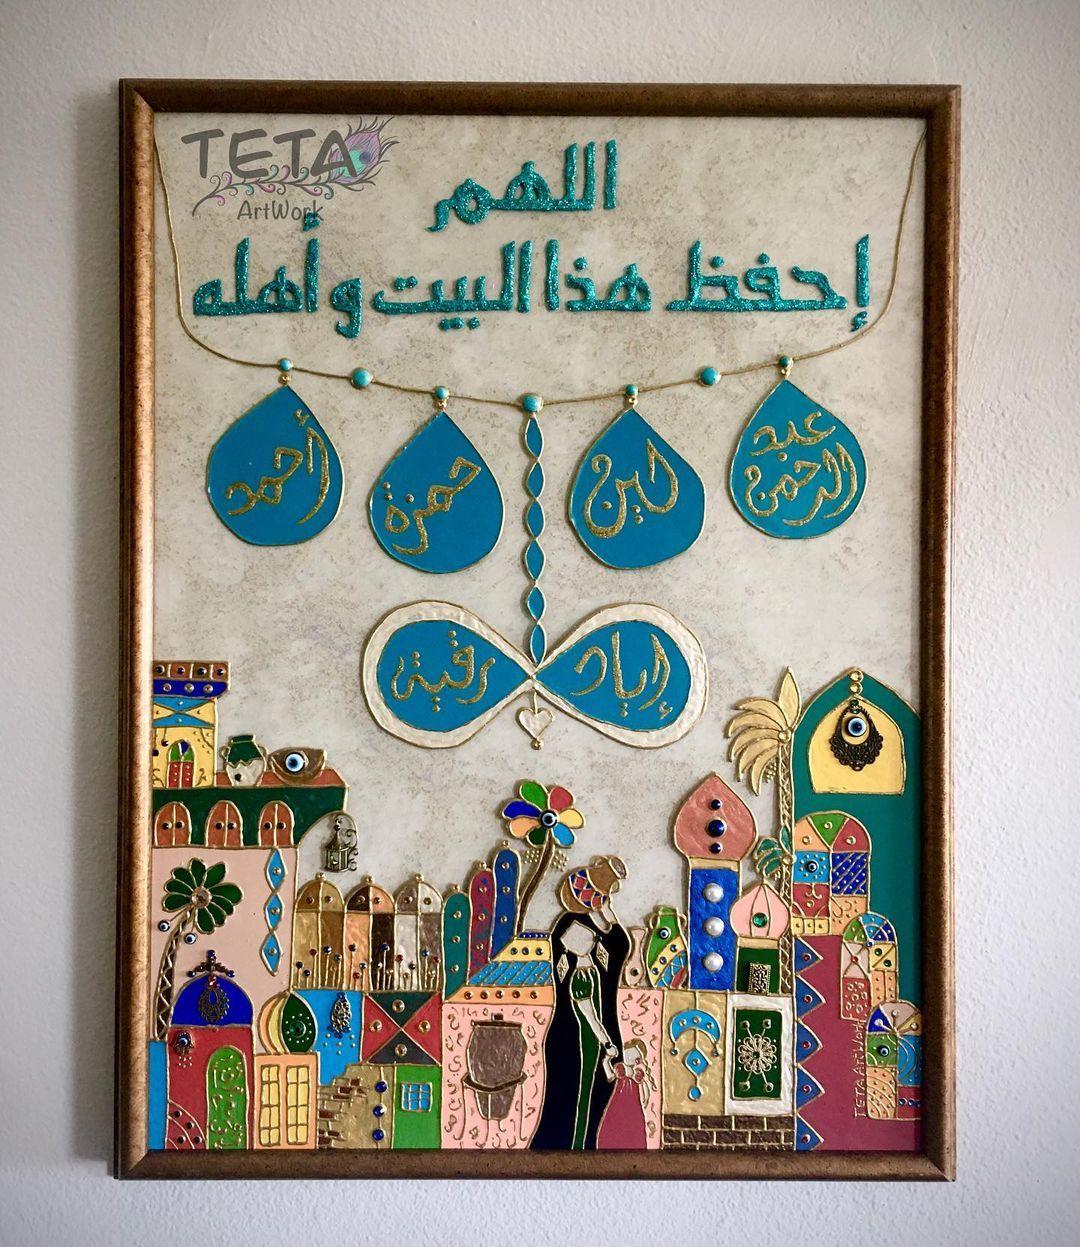 Pin On Teta Artwork